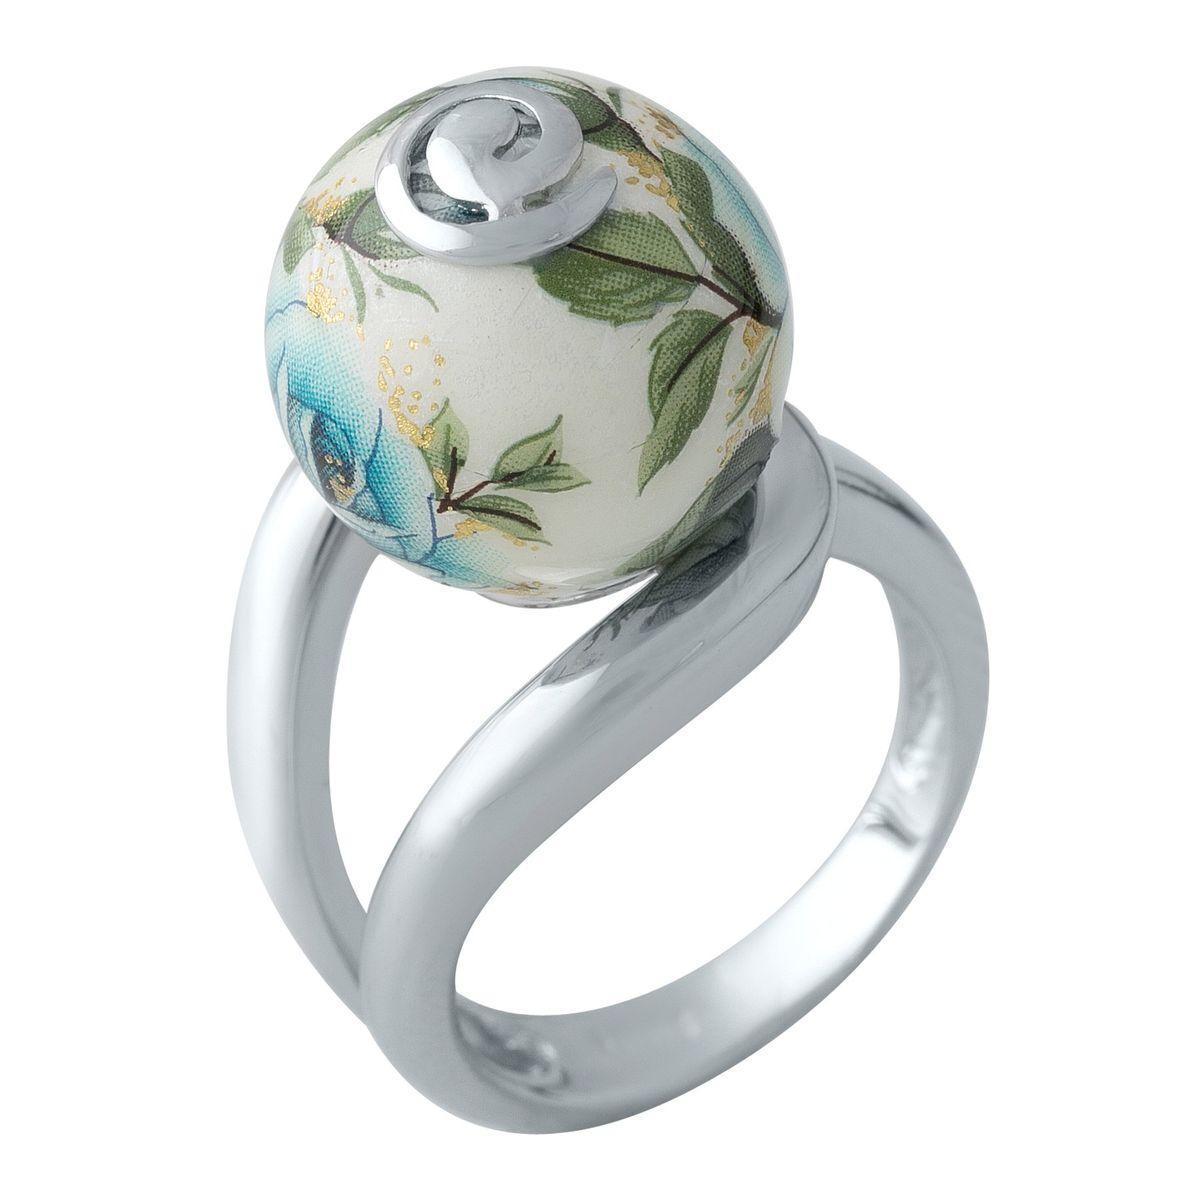 Серебряное кольцо DreamJewelry с емаллю (2003892) 18 размер